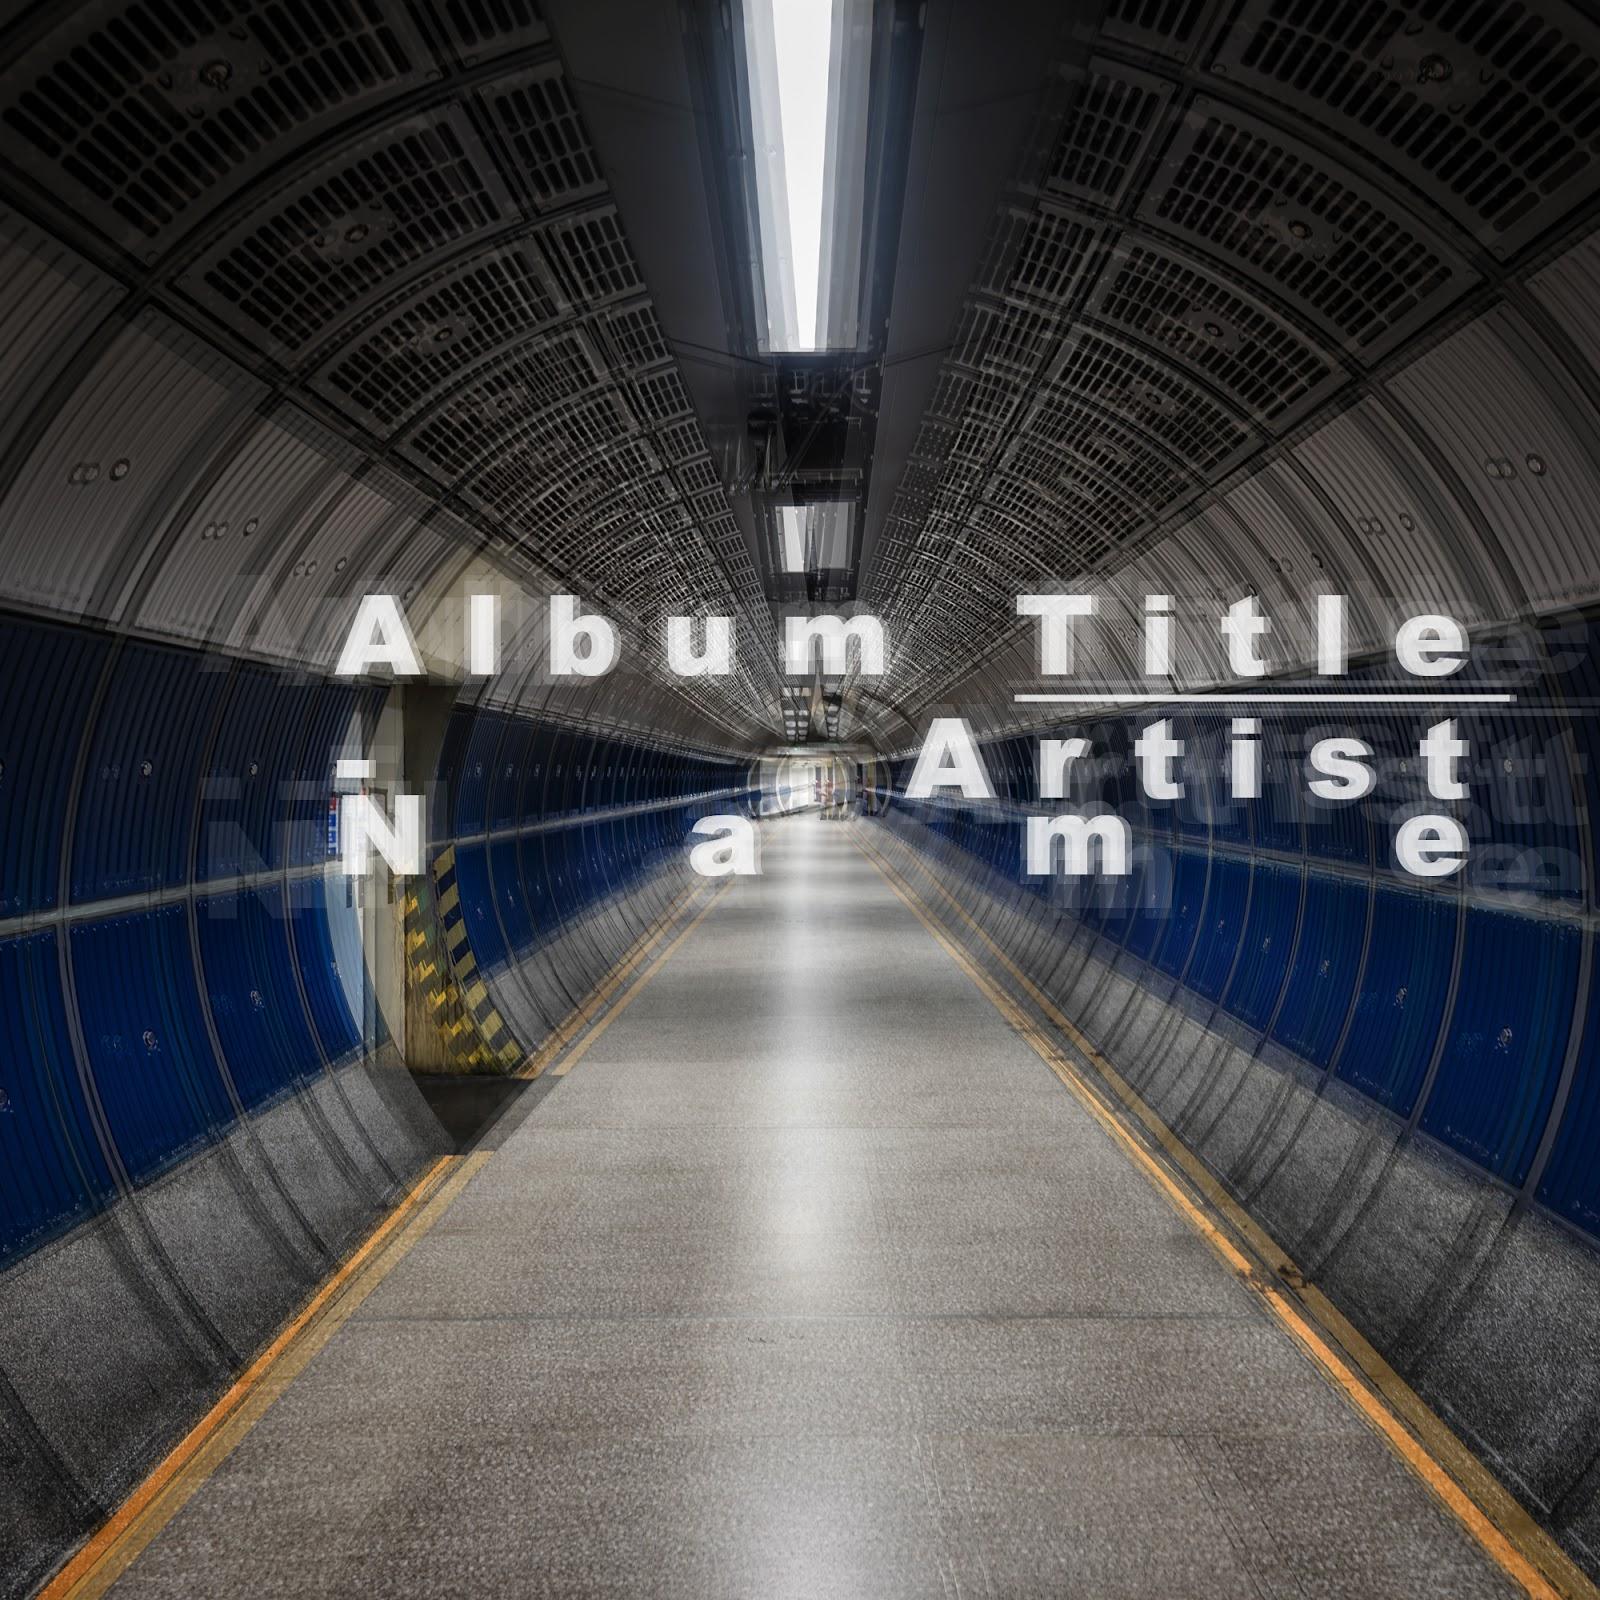 how to create album cover art